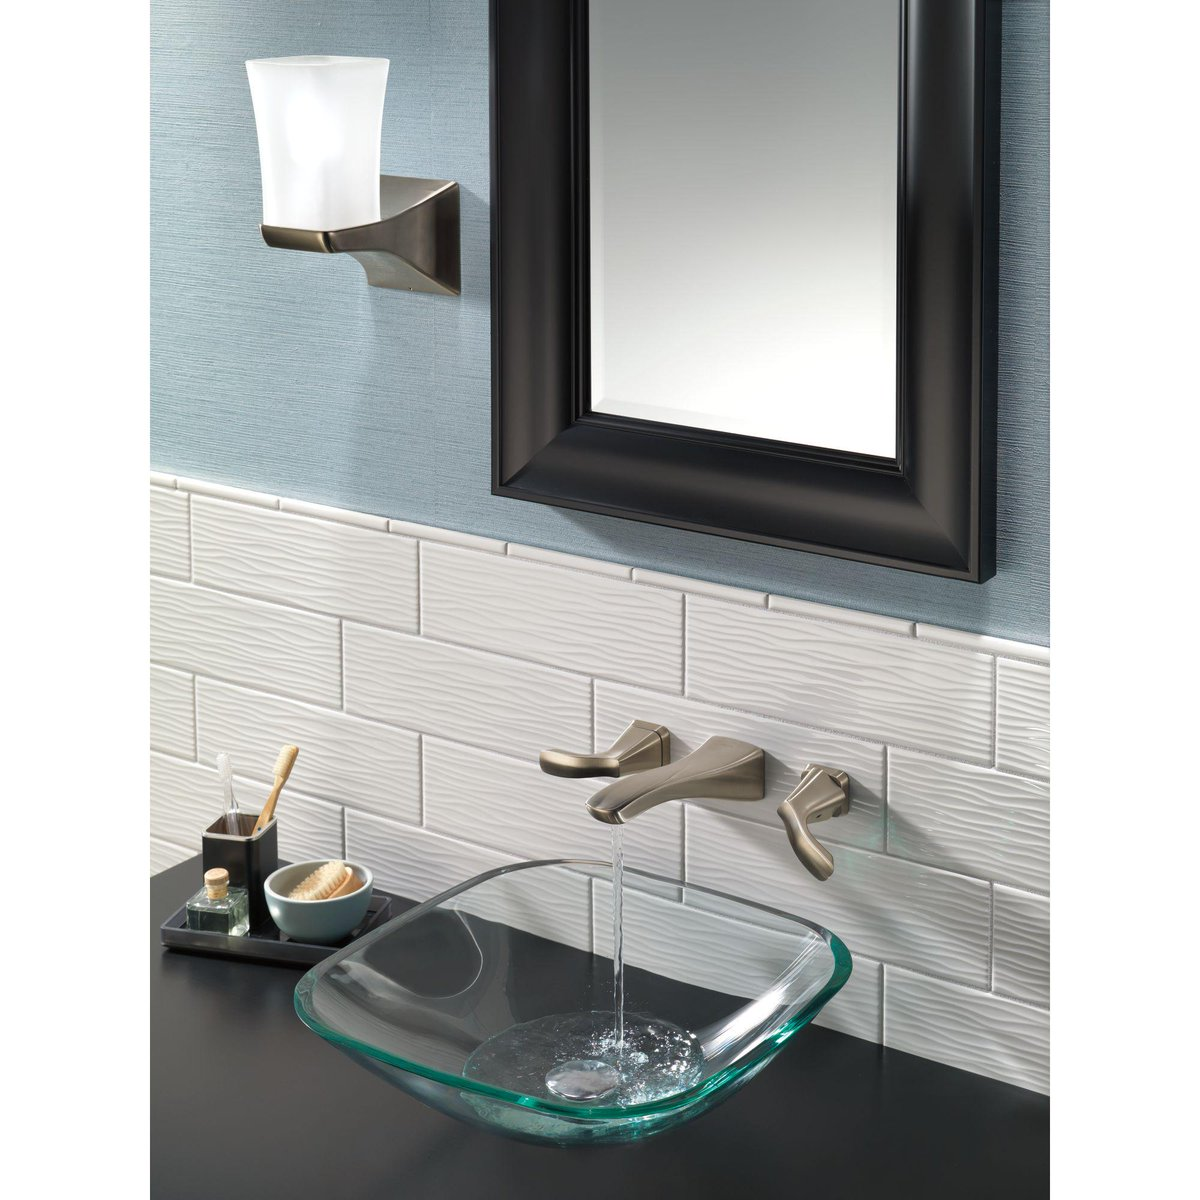 Fantastic Faucet Warehouse Coupon Sketch - Faucet Products ...